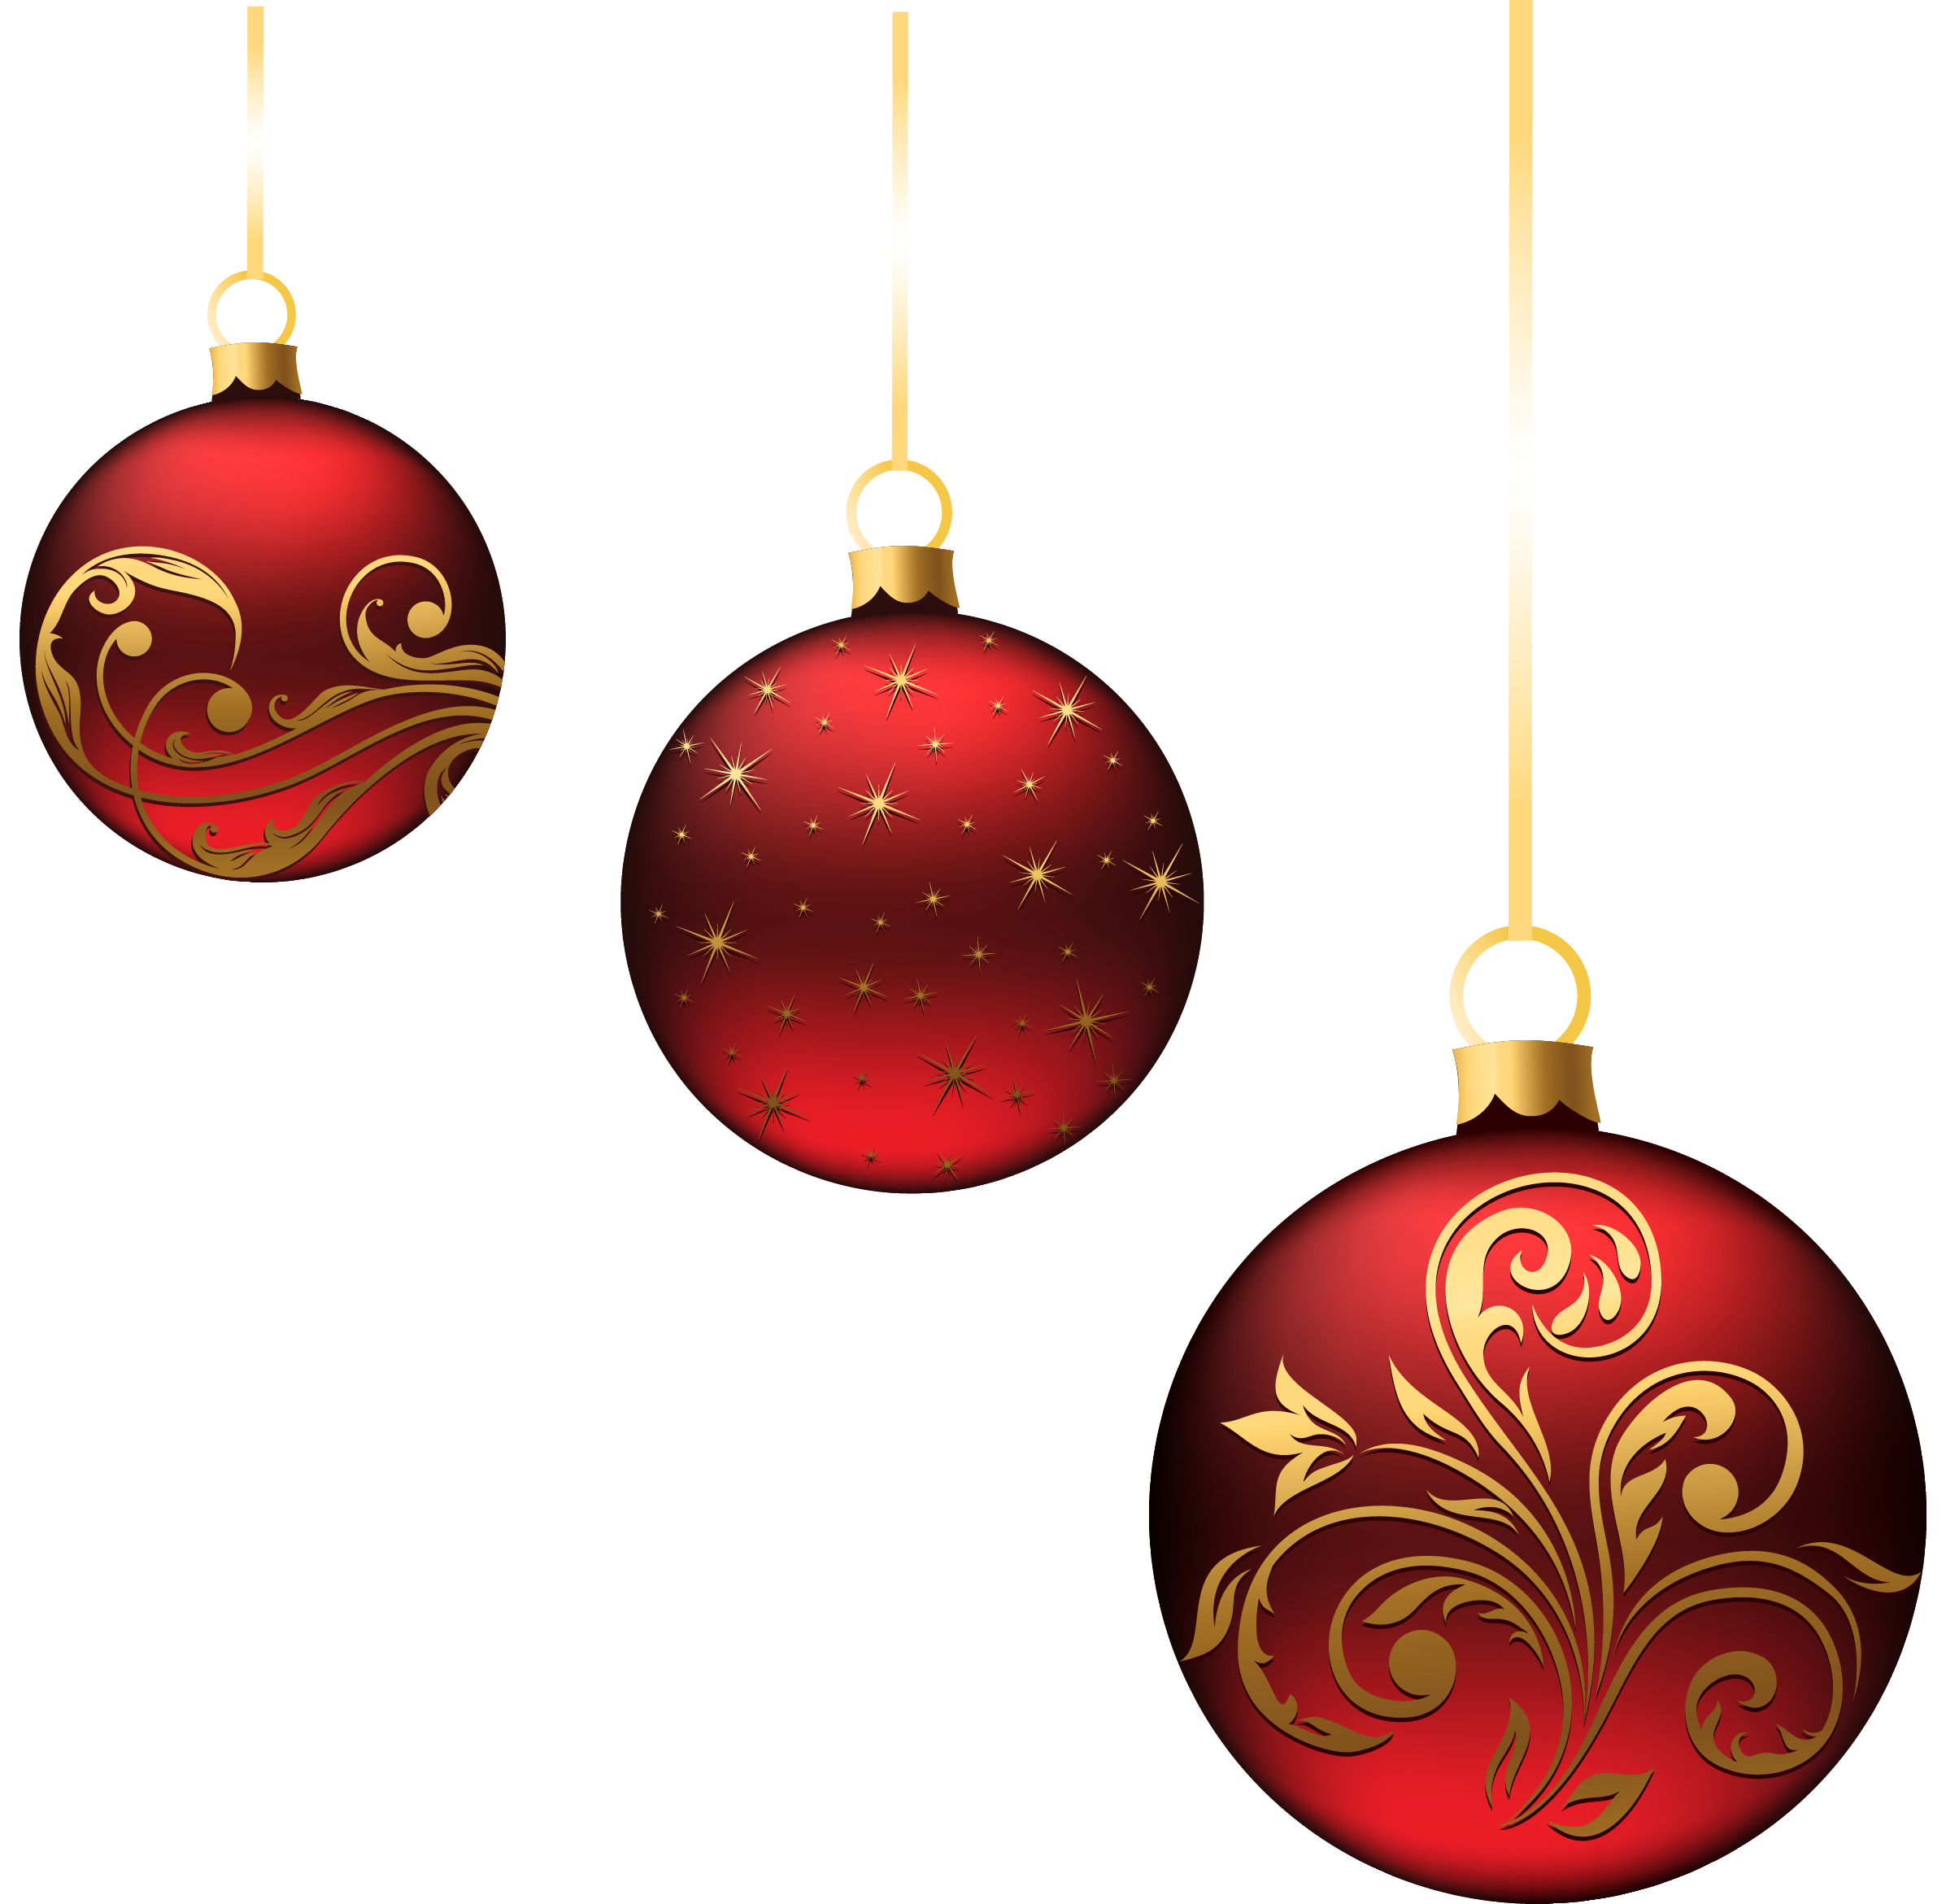 Christmas Ornament PNG Transparent Christmas Ornament.PNG Images.